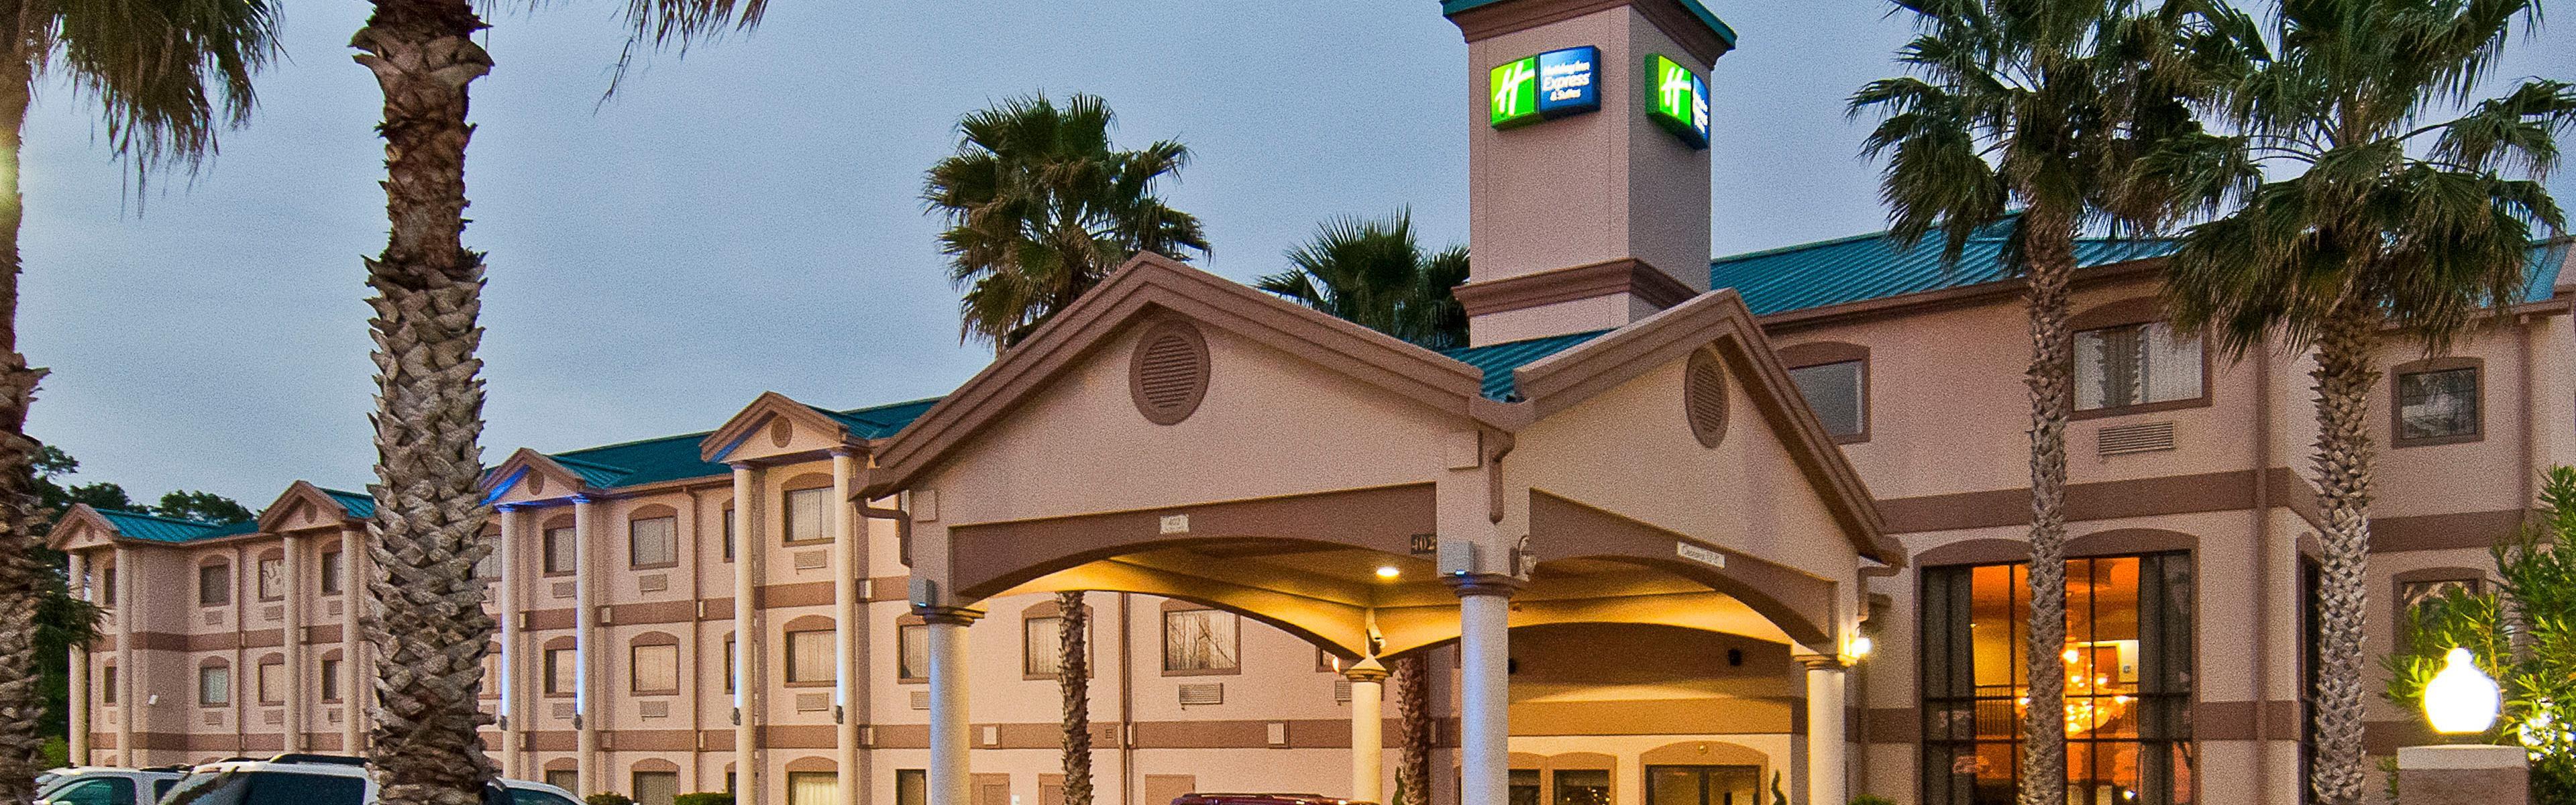 Holiday Inn Express & Suites Lake Charles image 0